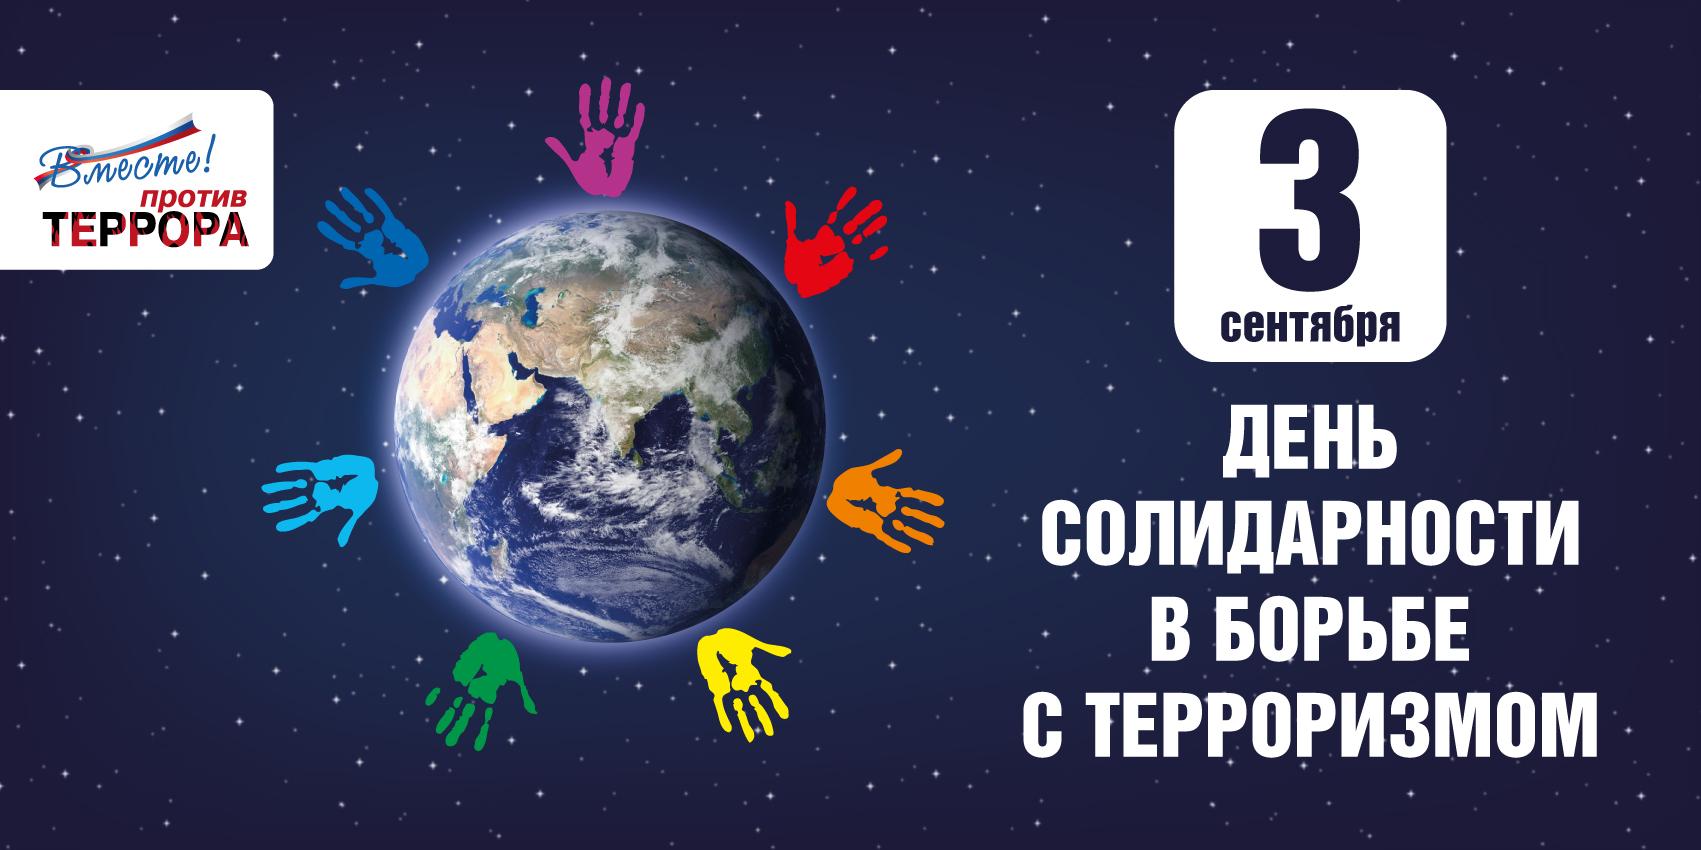 Днь солидарности против терроризма.